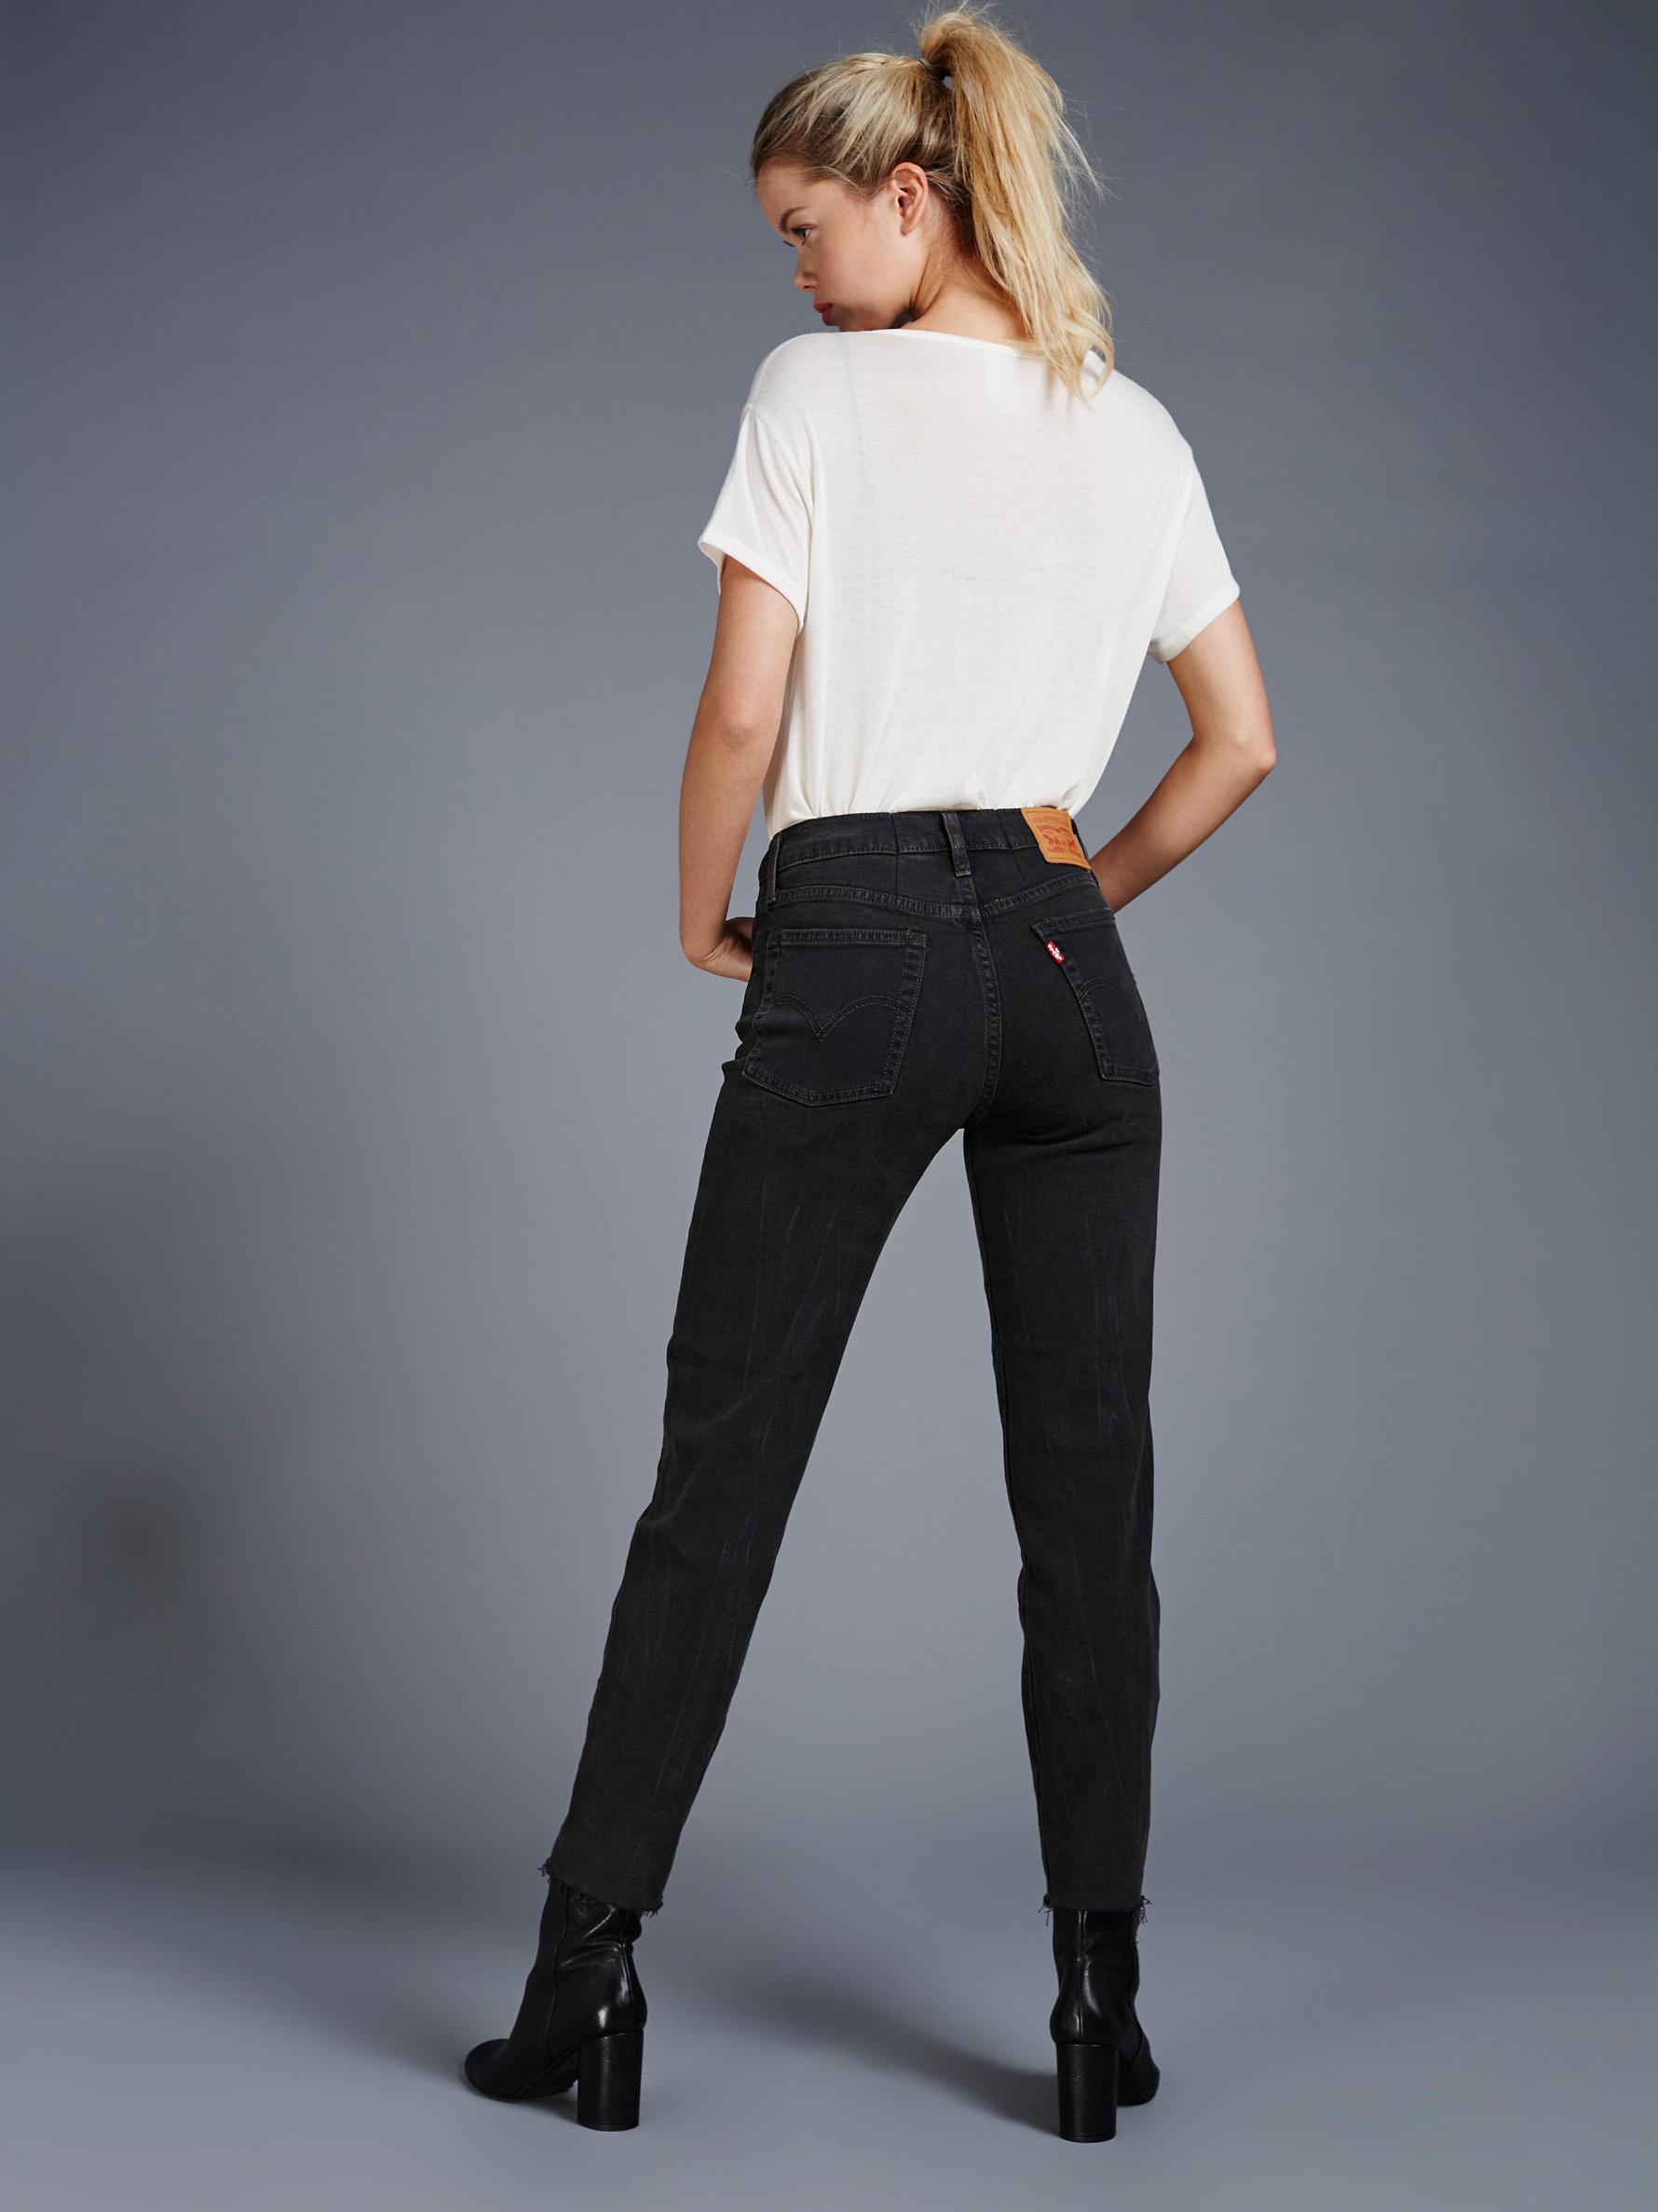 Levi S Women S Skinny Jeans